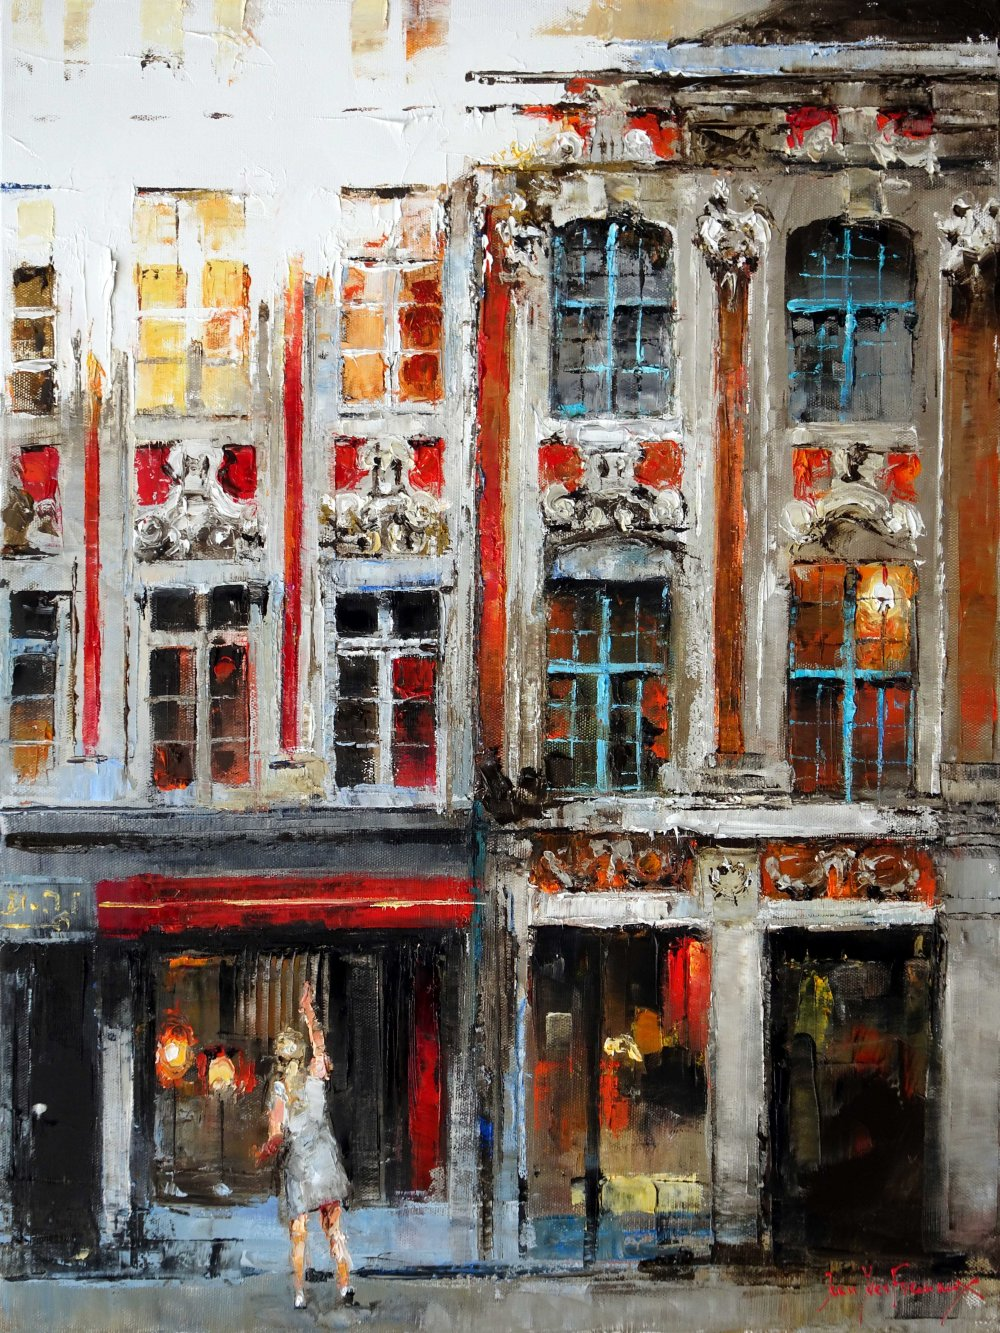 Les-vitrines-de-la-rue-de-la-Bourse-12P